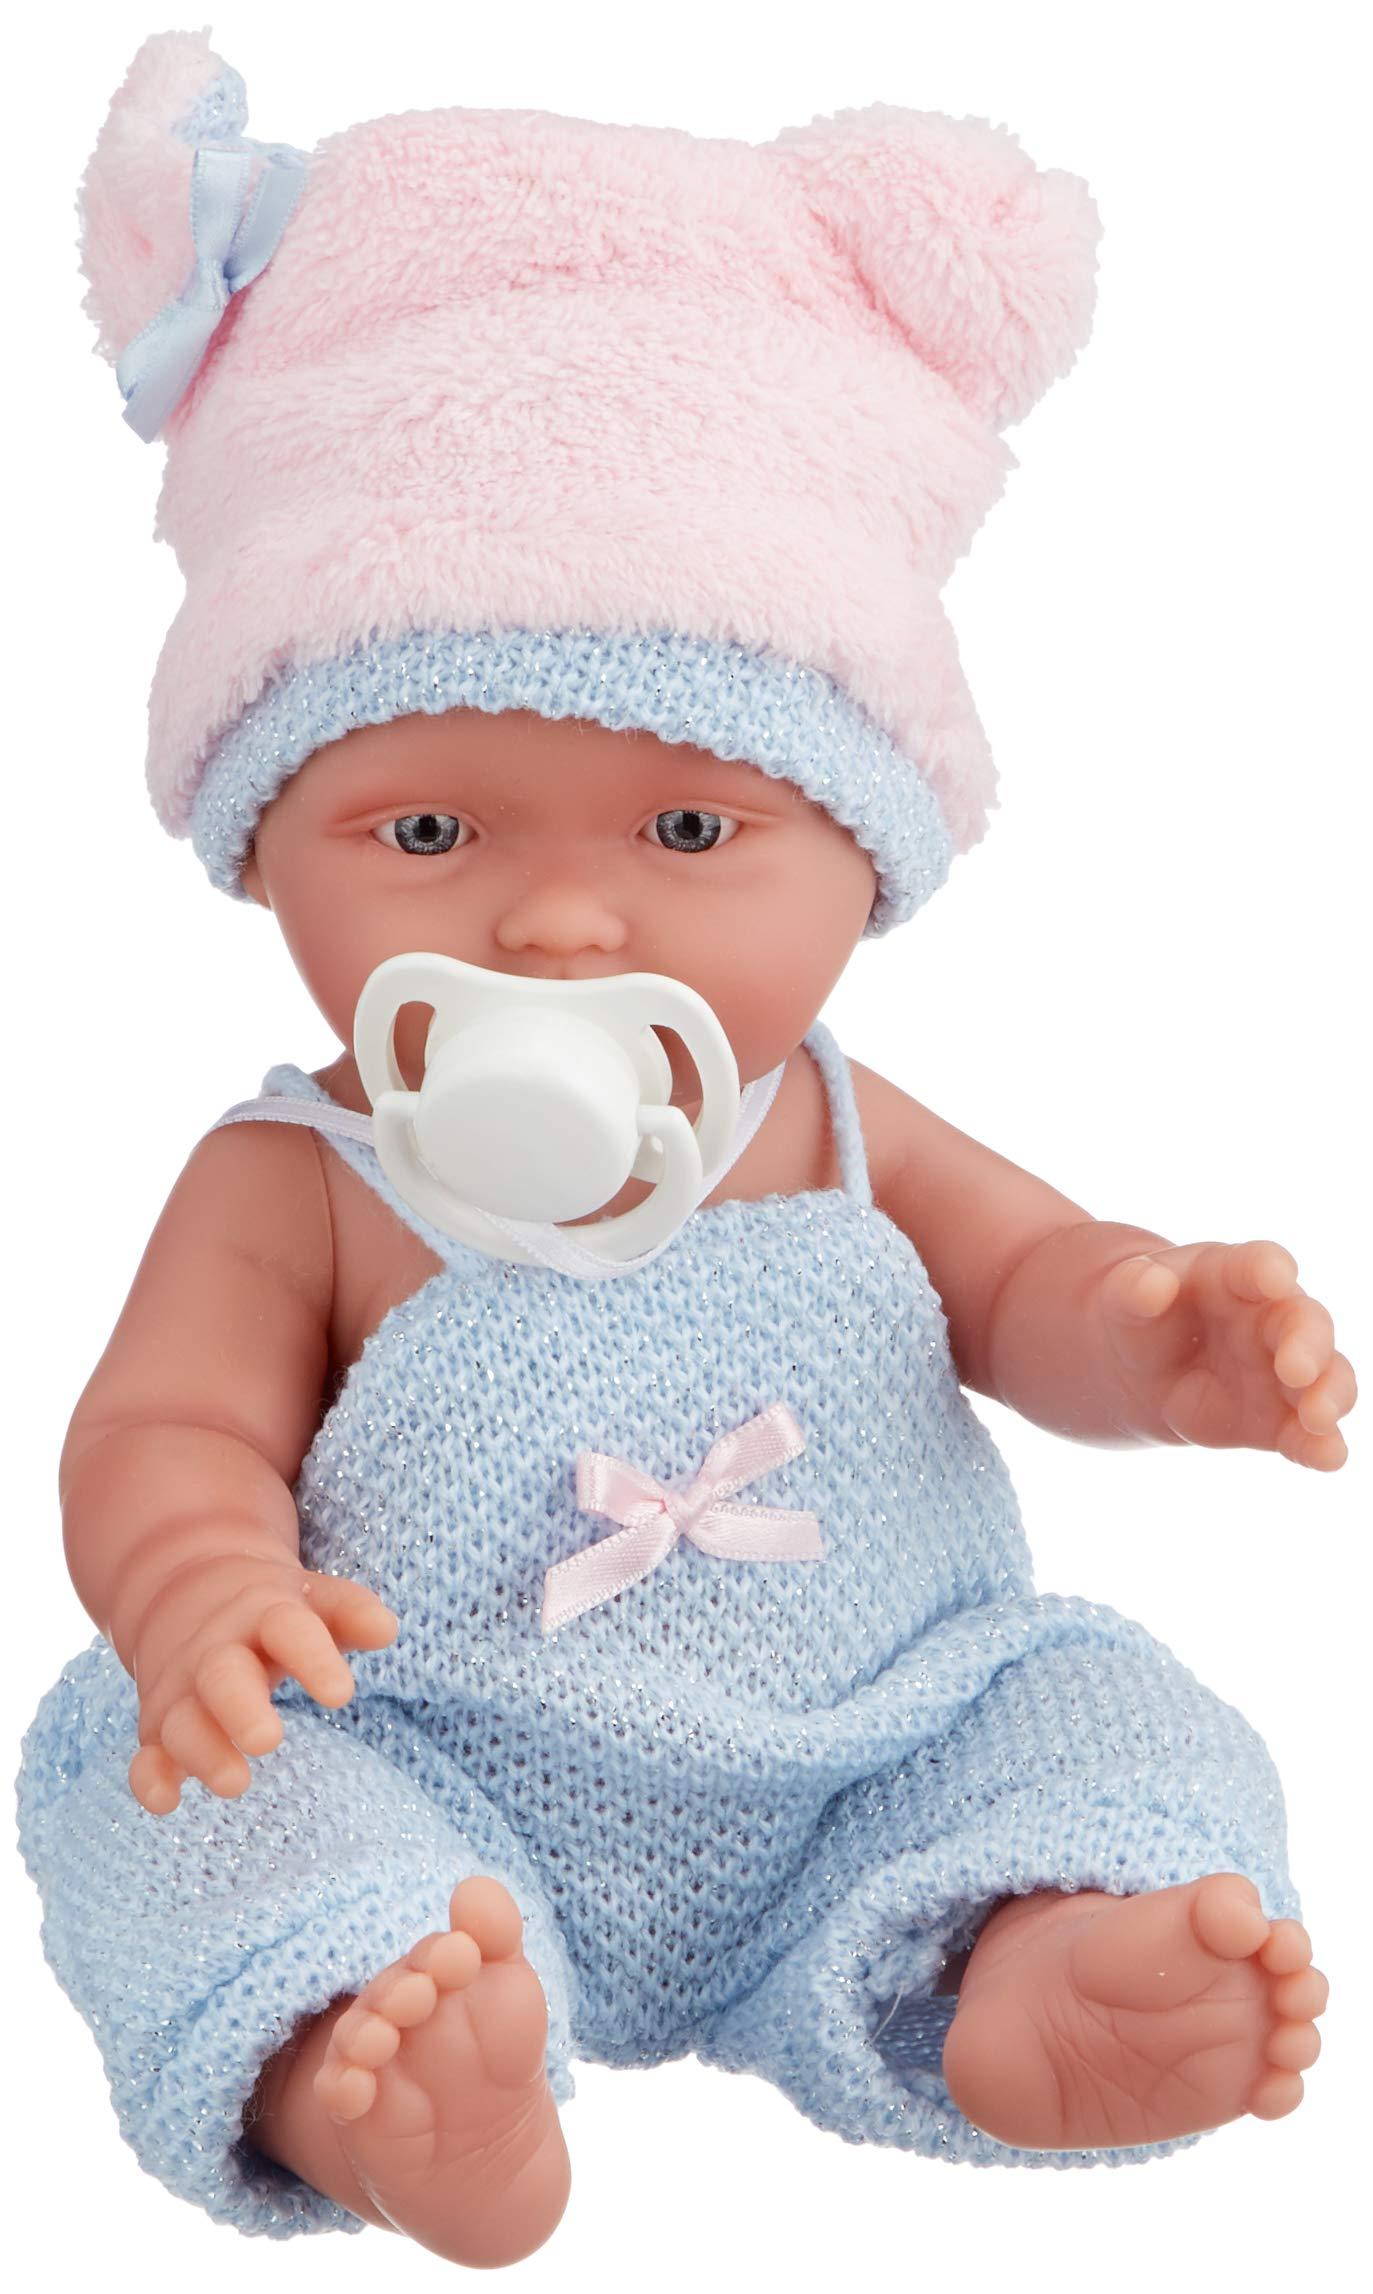 "Llorens 10.2"" Anatomically-Correct Baby Doll Carper, Blue"